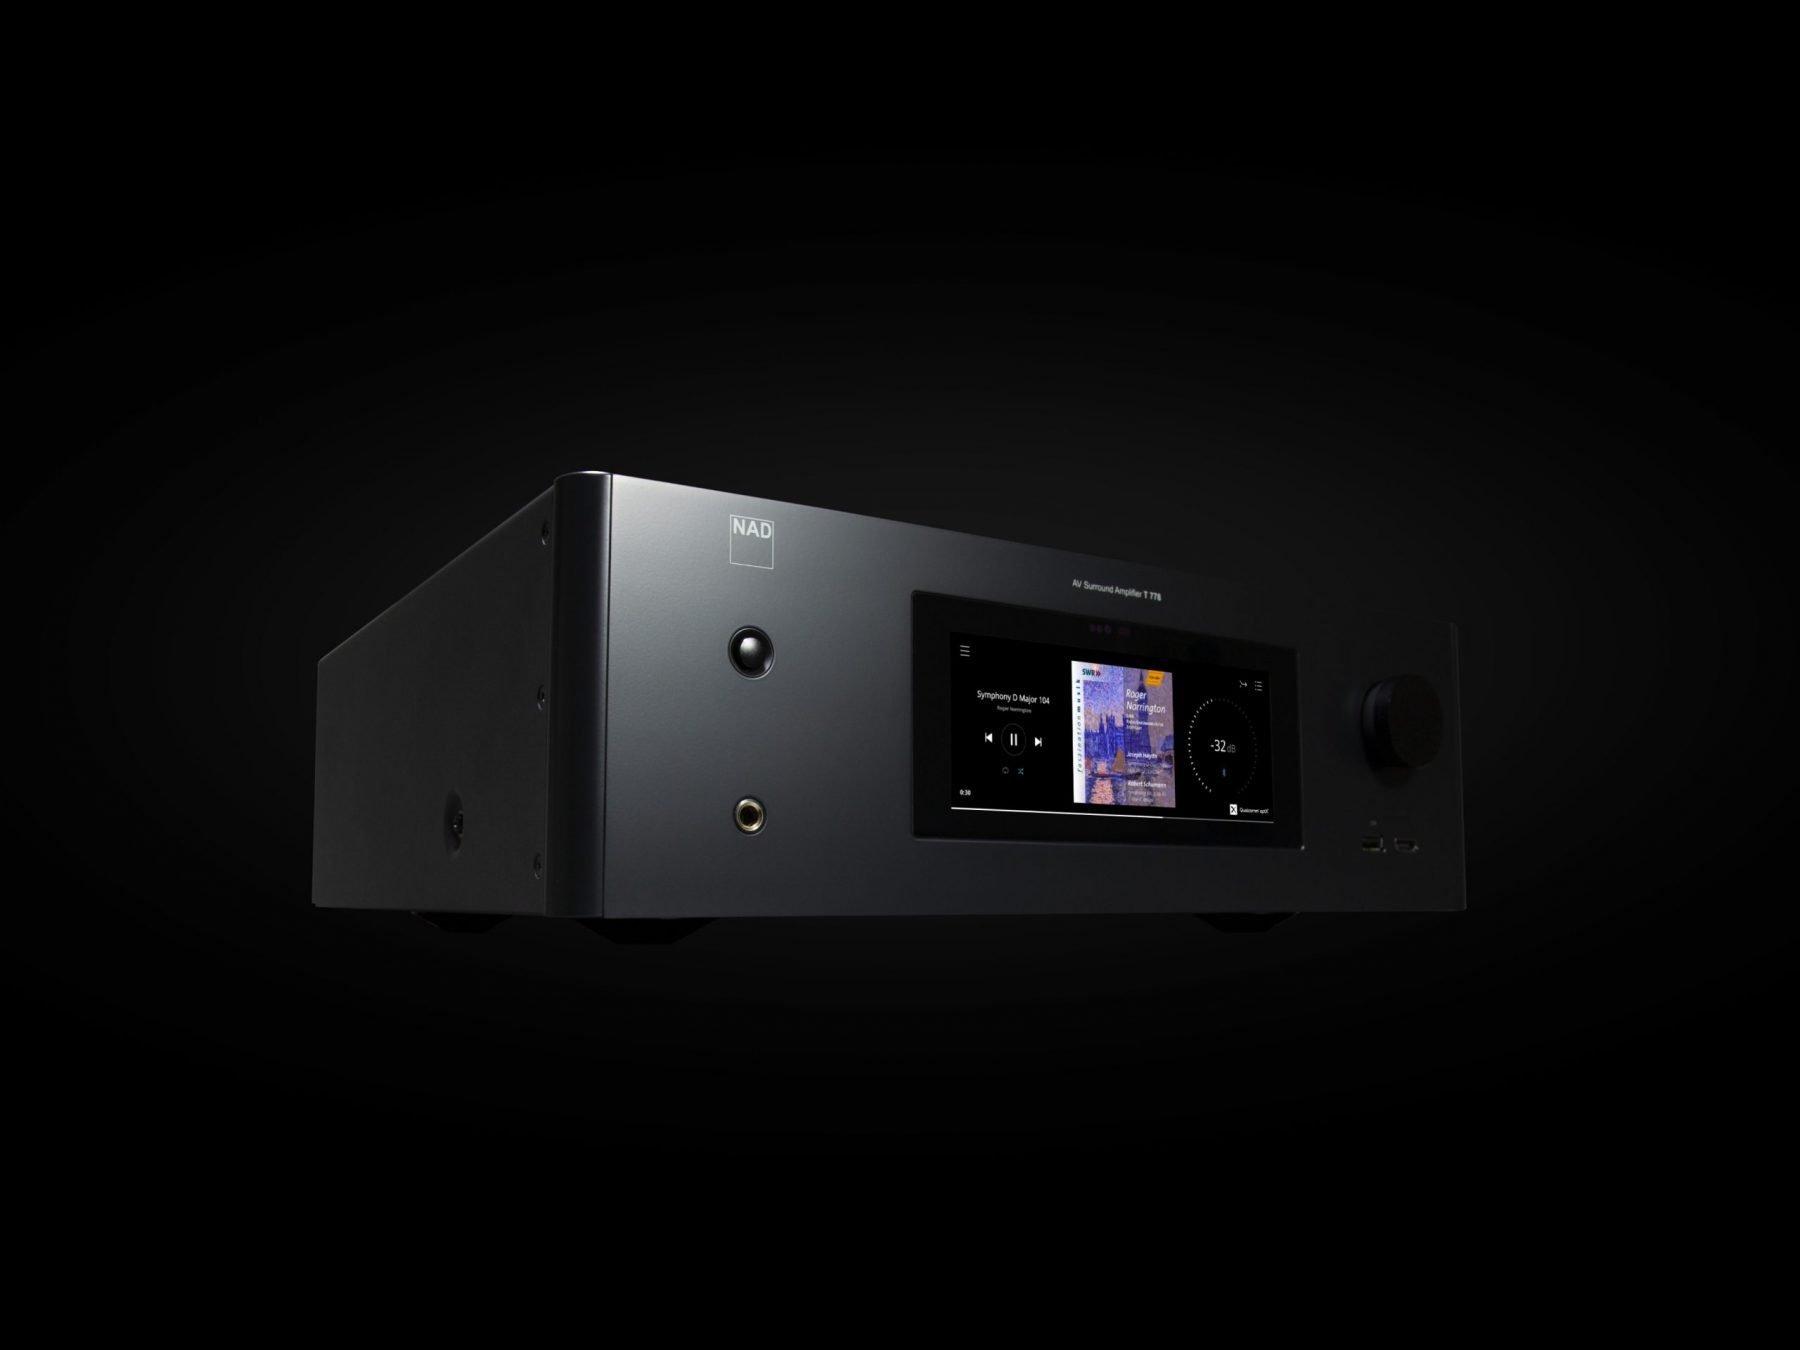 T 778 AV Receiver 9x80W (NAD Full Disclosure Power)